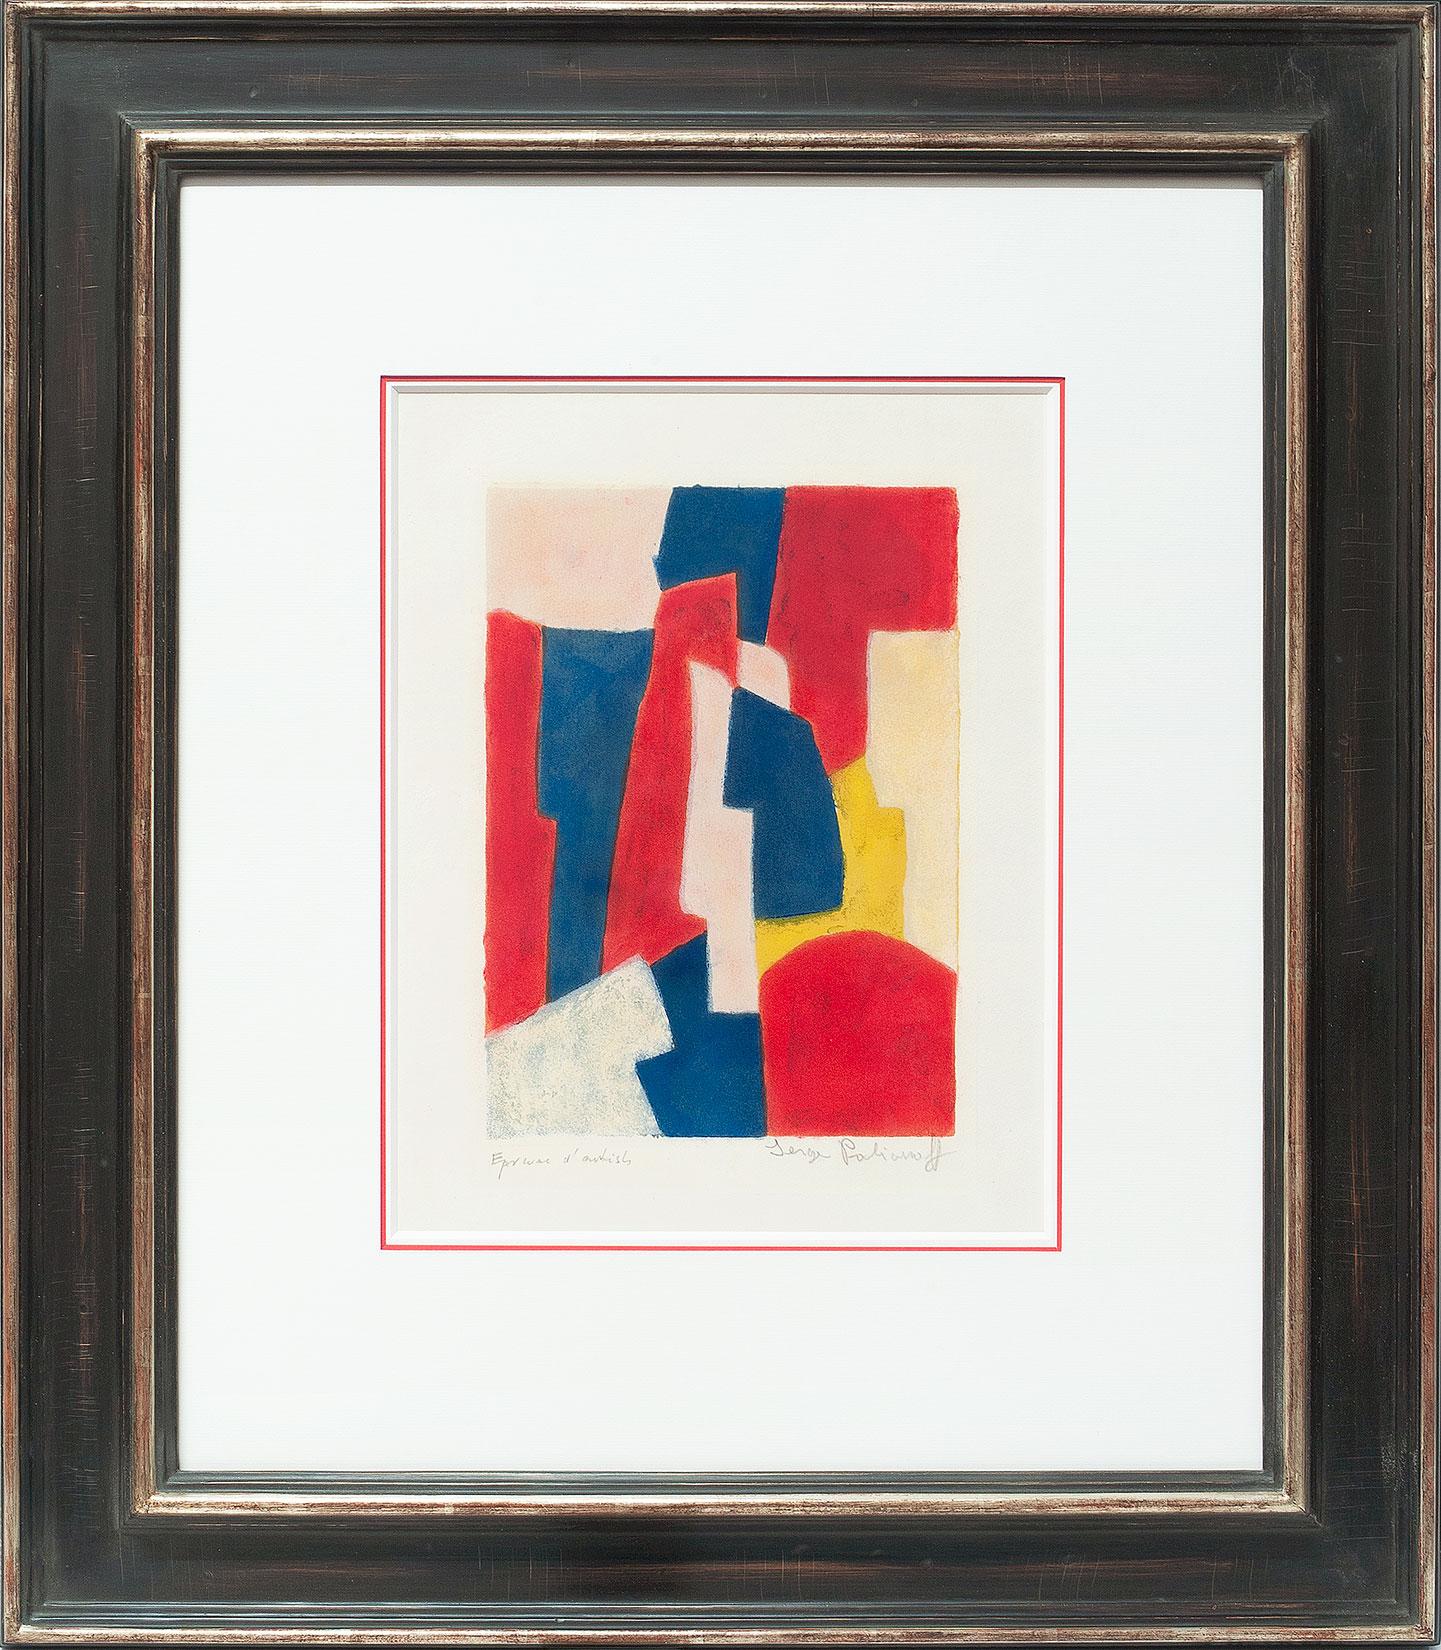 Serge Poliakoff «Composition bleue, rouge et rose» Galerie Française